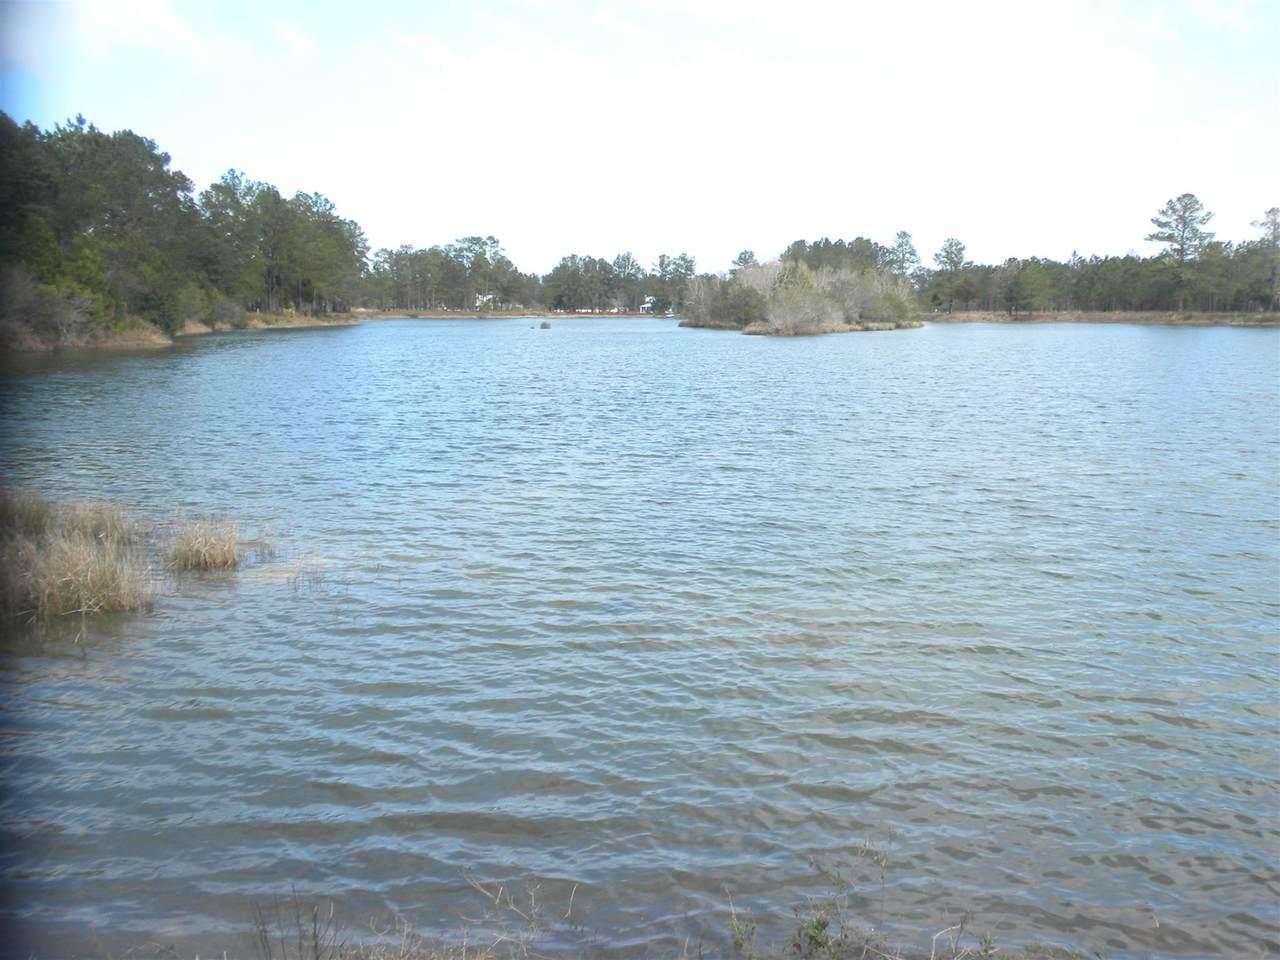 1520 Janells River Dr - Photo 1